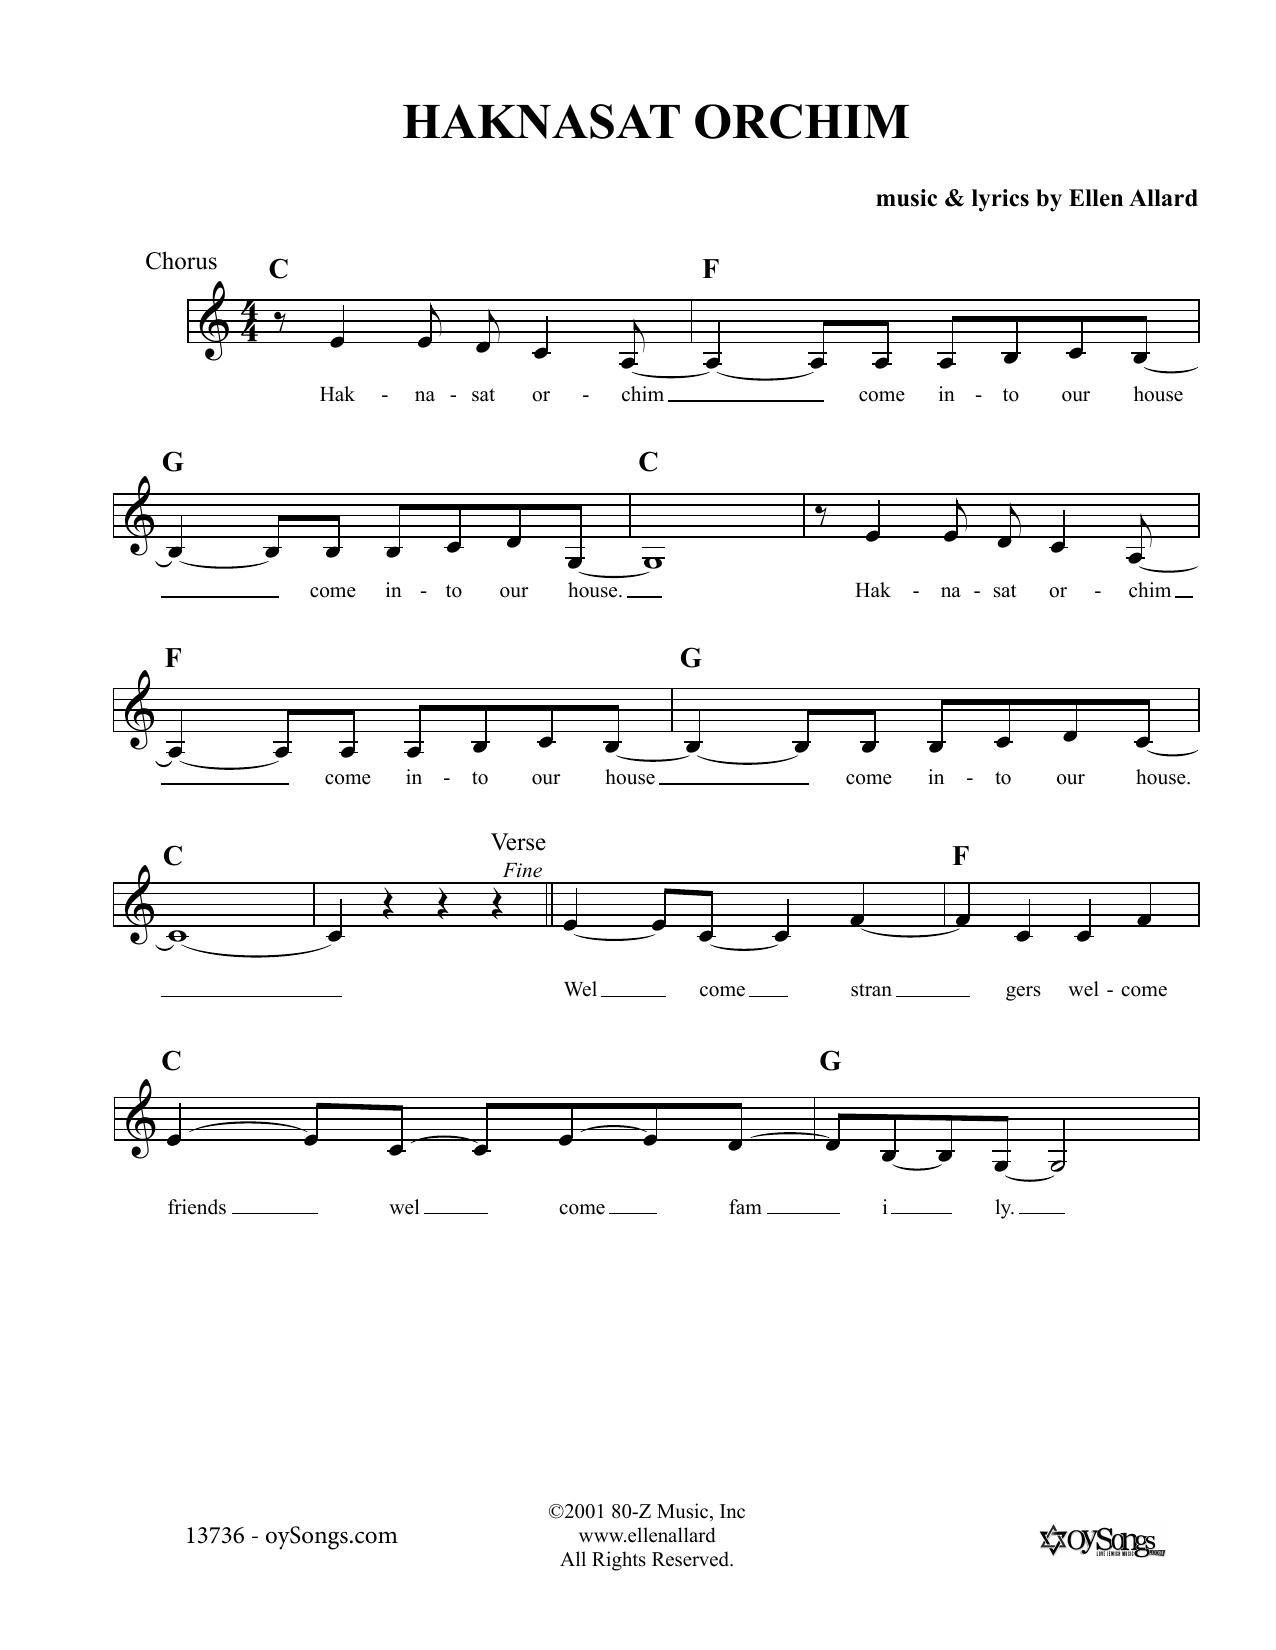 Ellen Allard Haknasat Orchim sheet music notes and chords. Download Printable PDF.